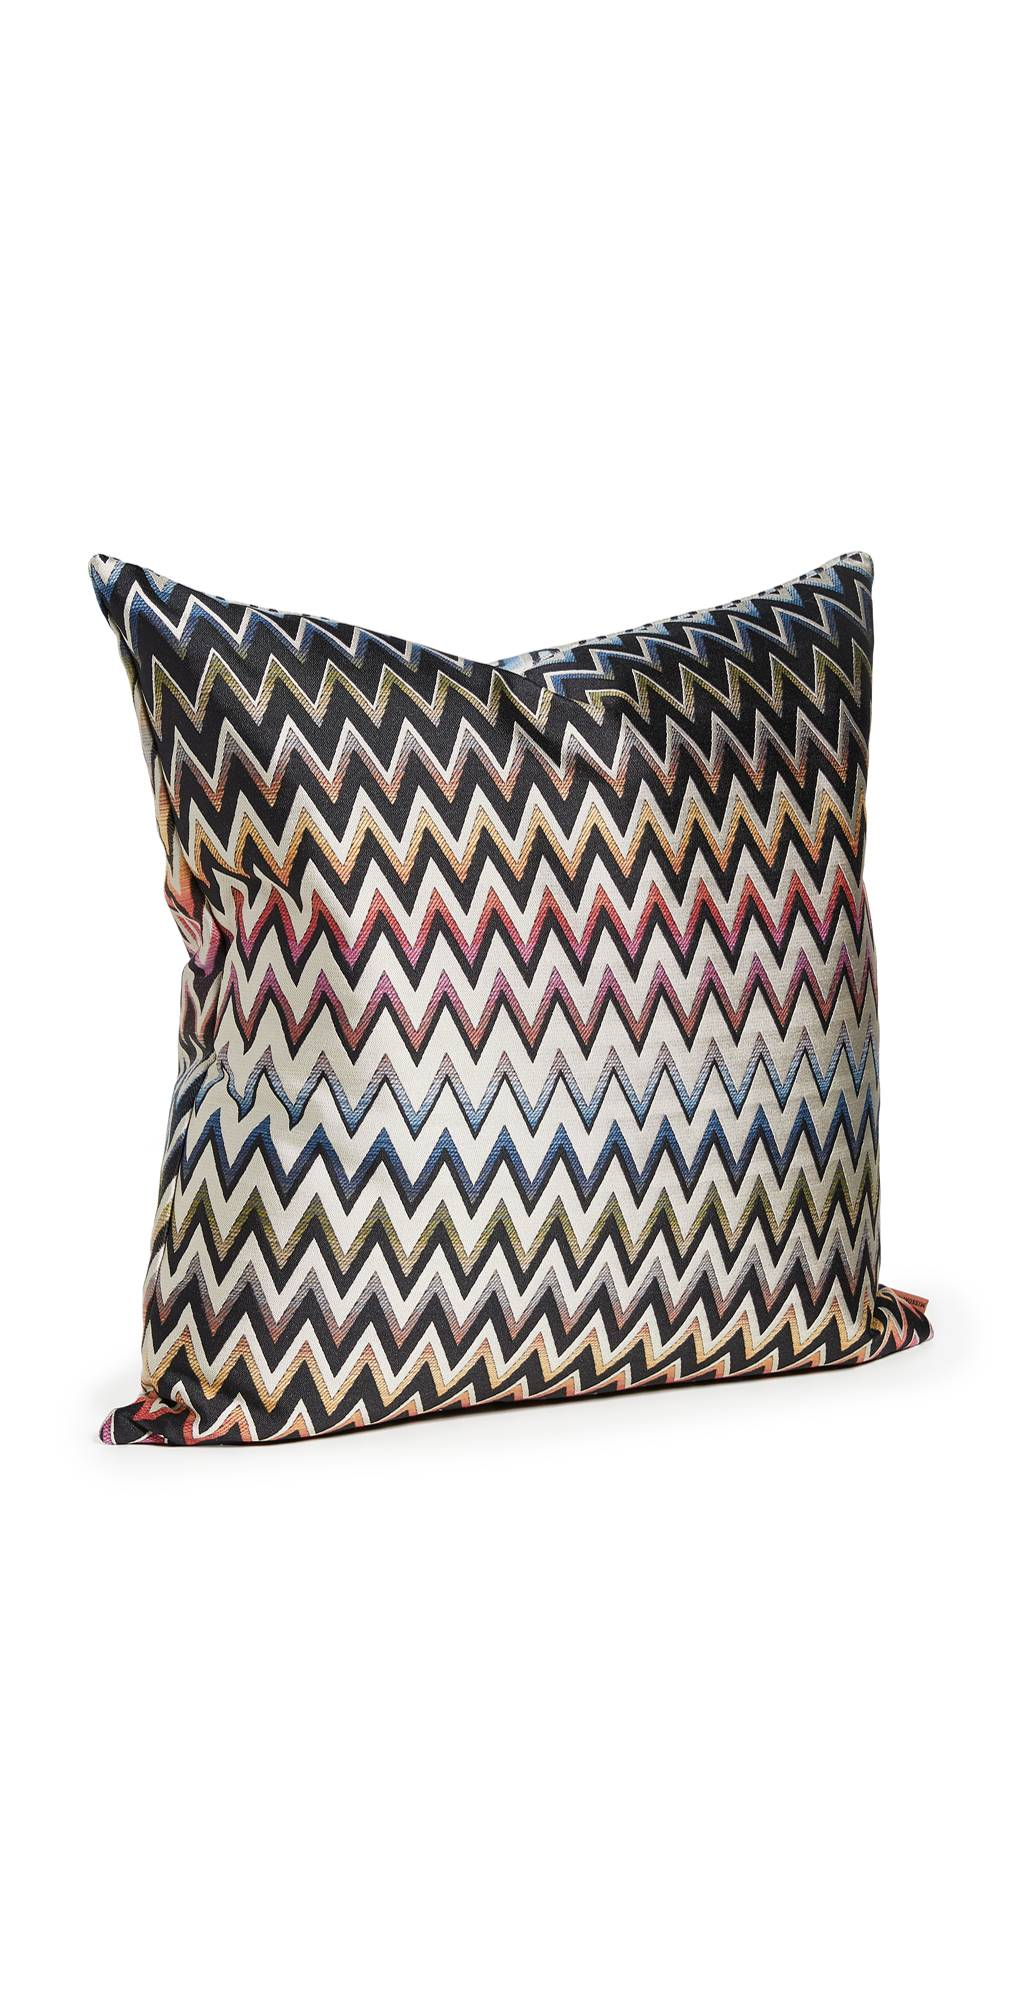 Missoni Home Vernal Cushion  - Black Multi - Size: One Size